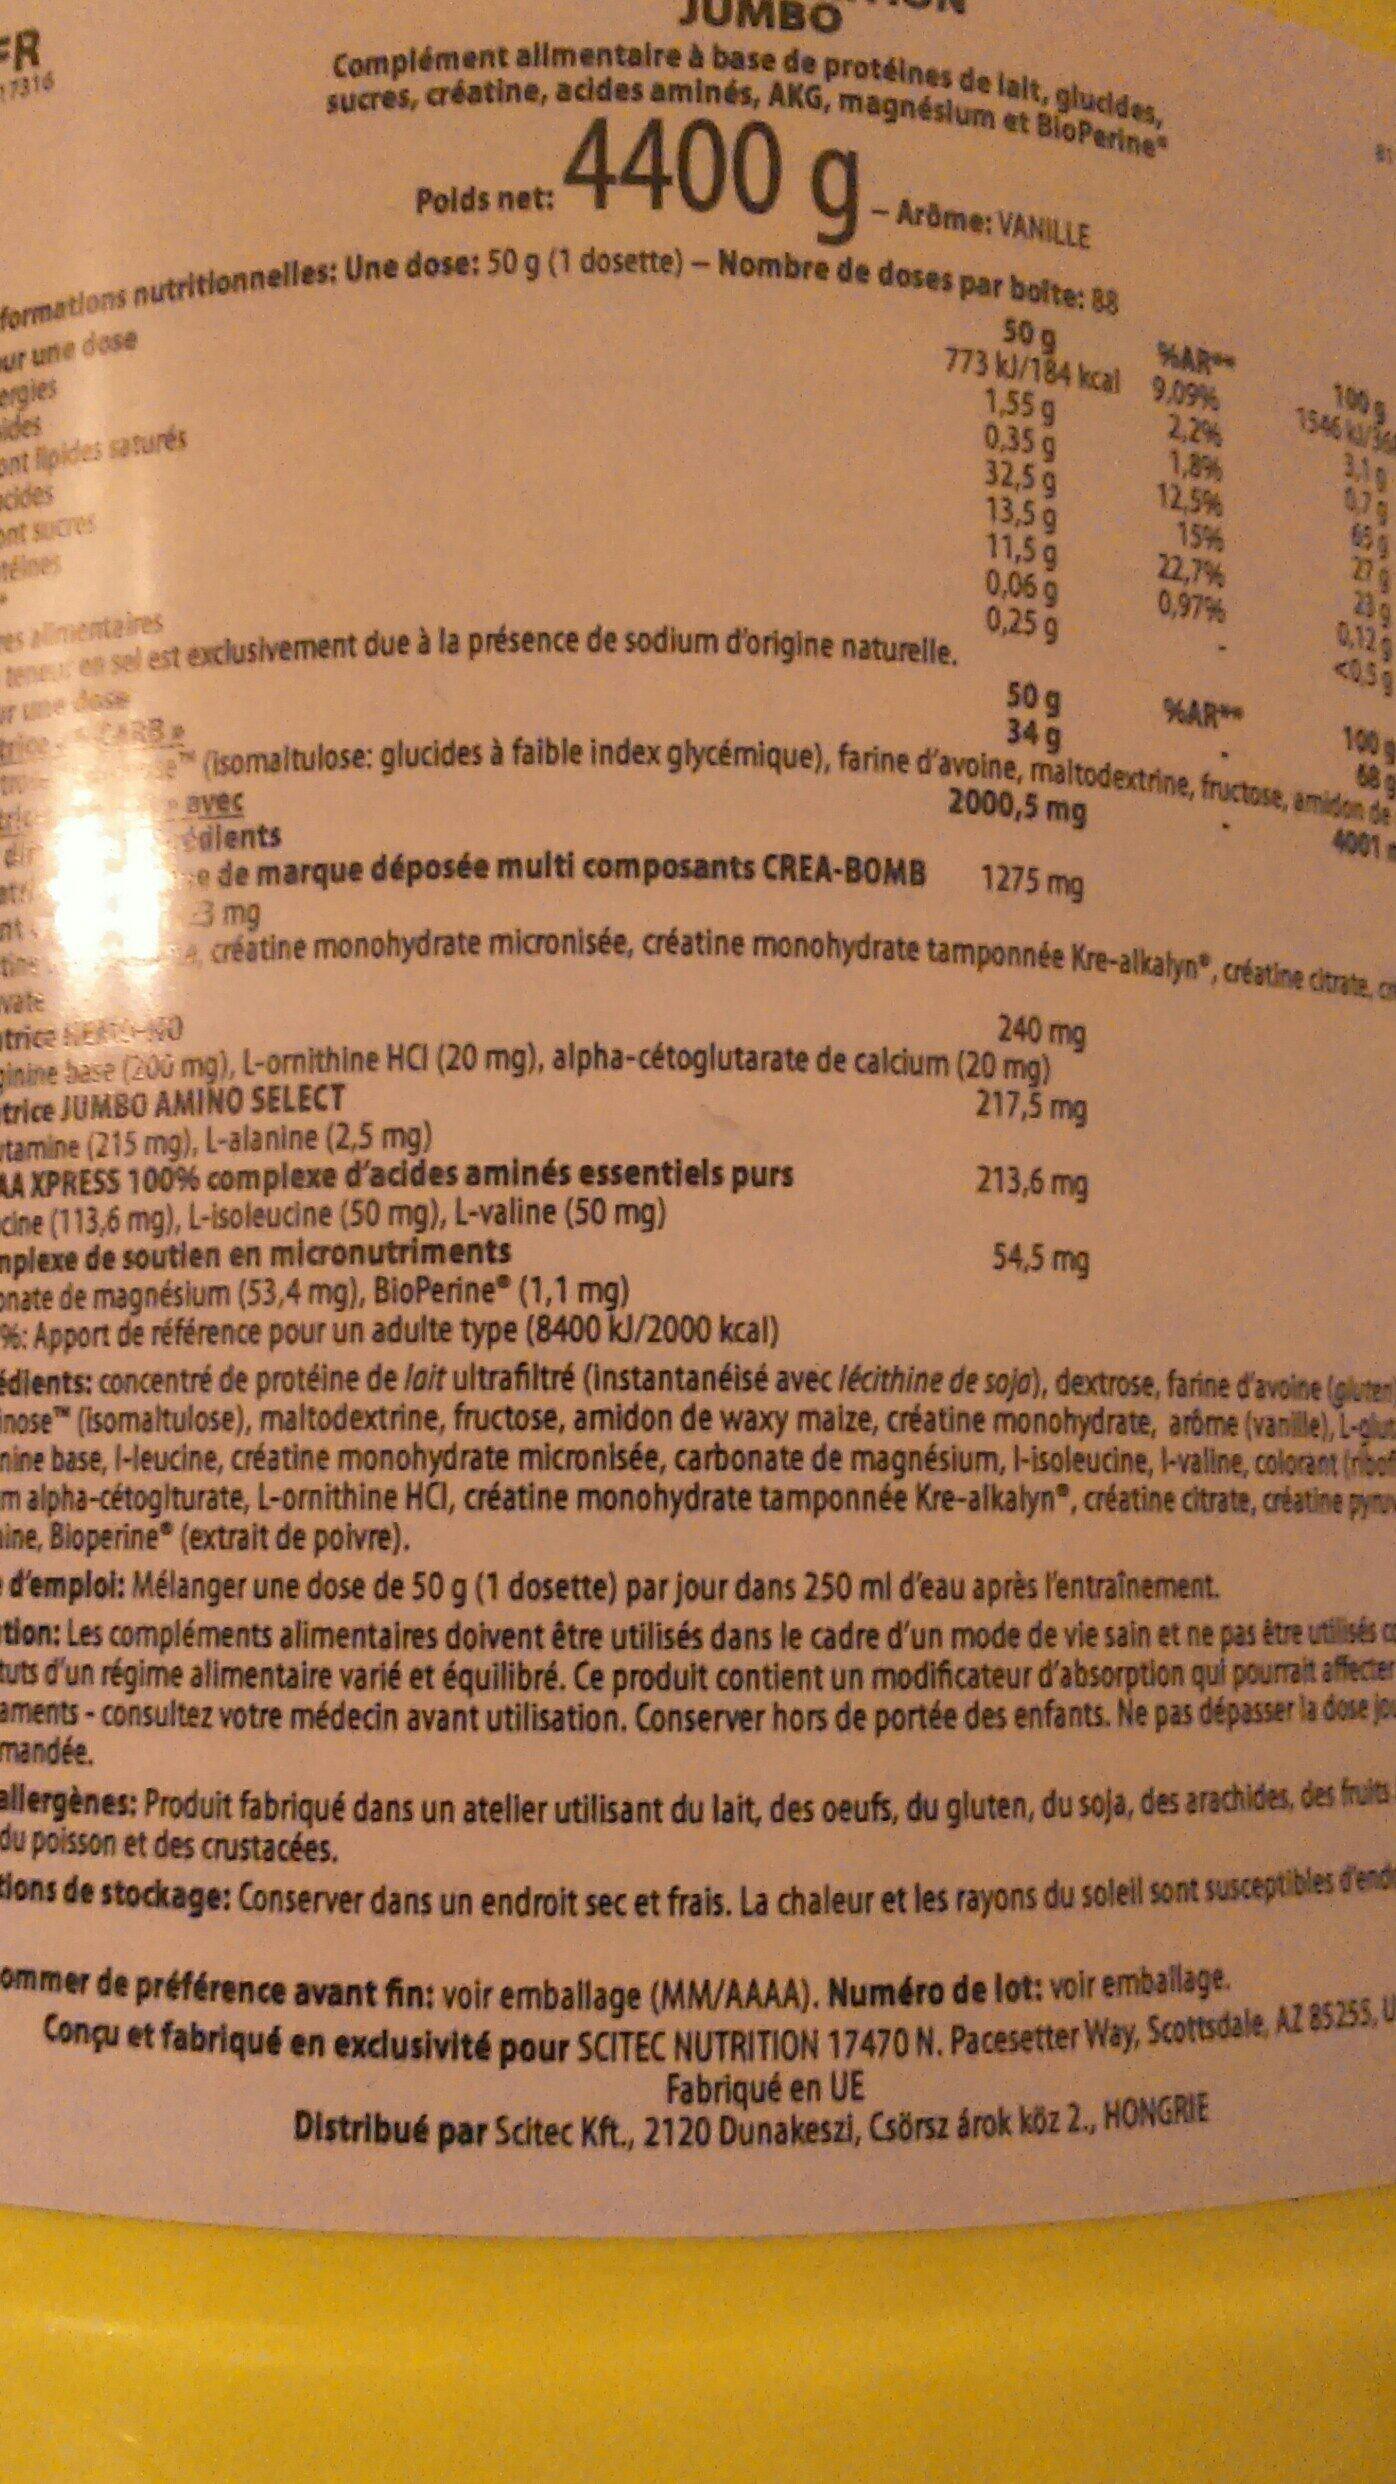 Sctec Nutrition Jumbo 4400 Gr Vanilla - Ingredients - fr